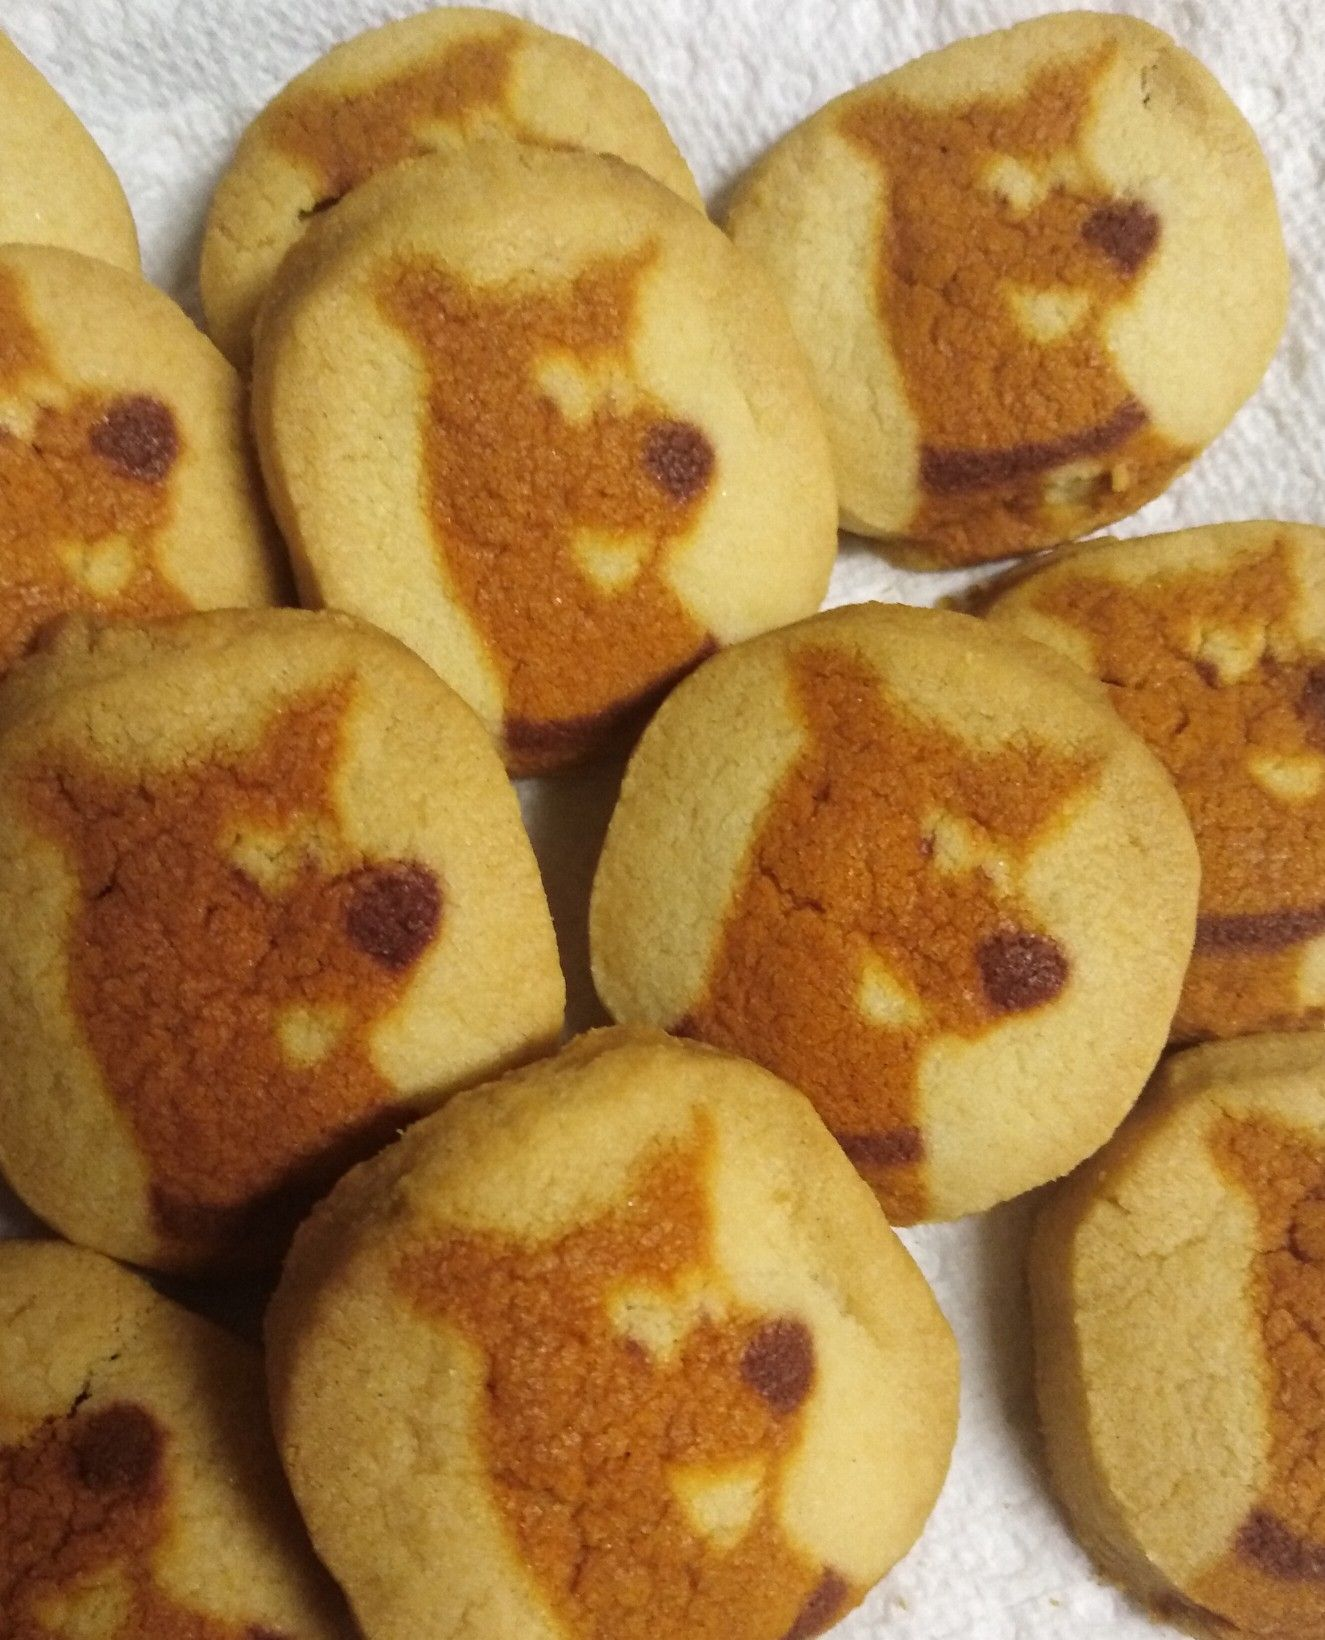 pillsbury #scooby #doo ready to bake sugar cookies. good treat idea